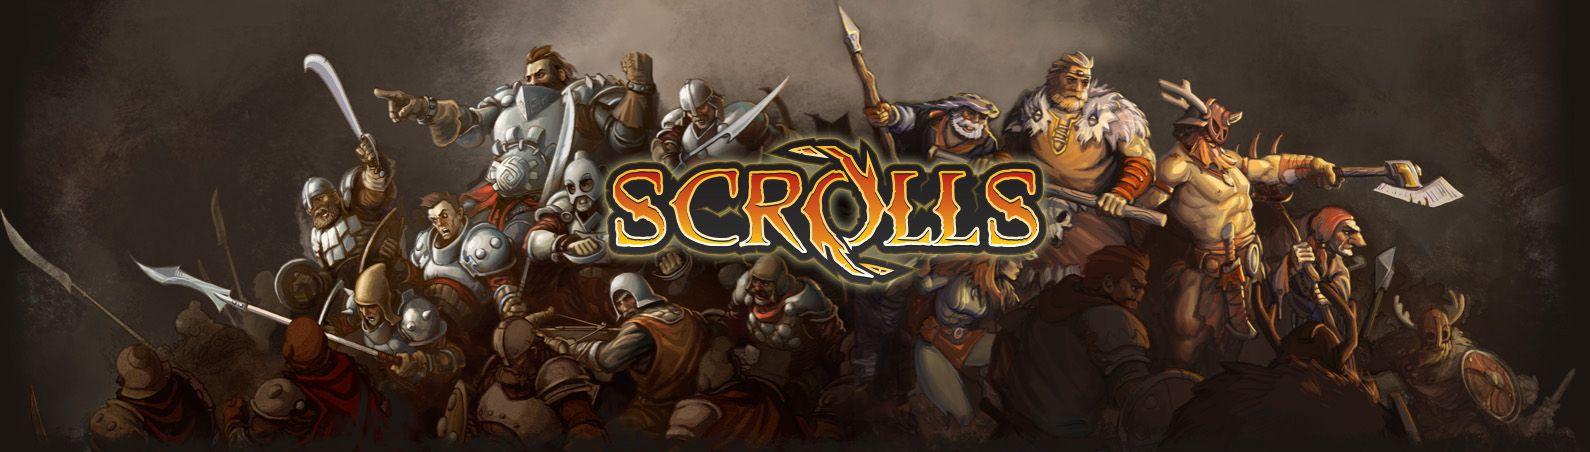 scrolls-mojang-minecraft